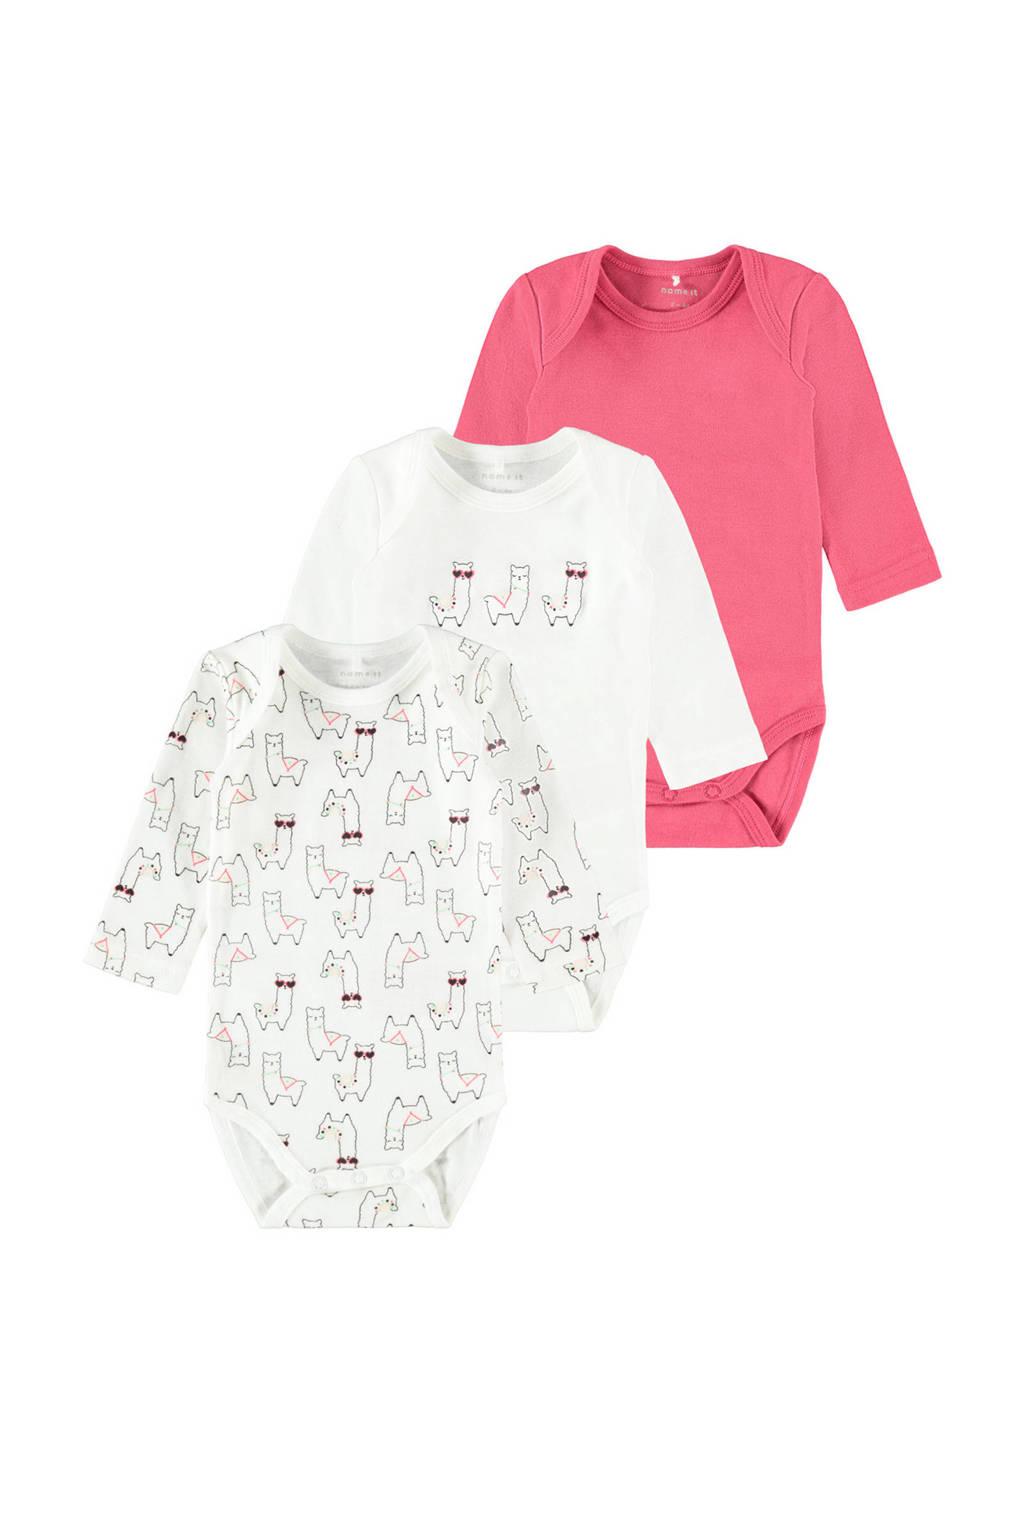 NAME IT BABY romper - set van 3 wit/roze, Roze/wit